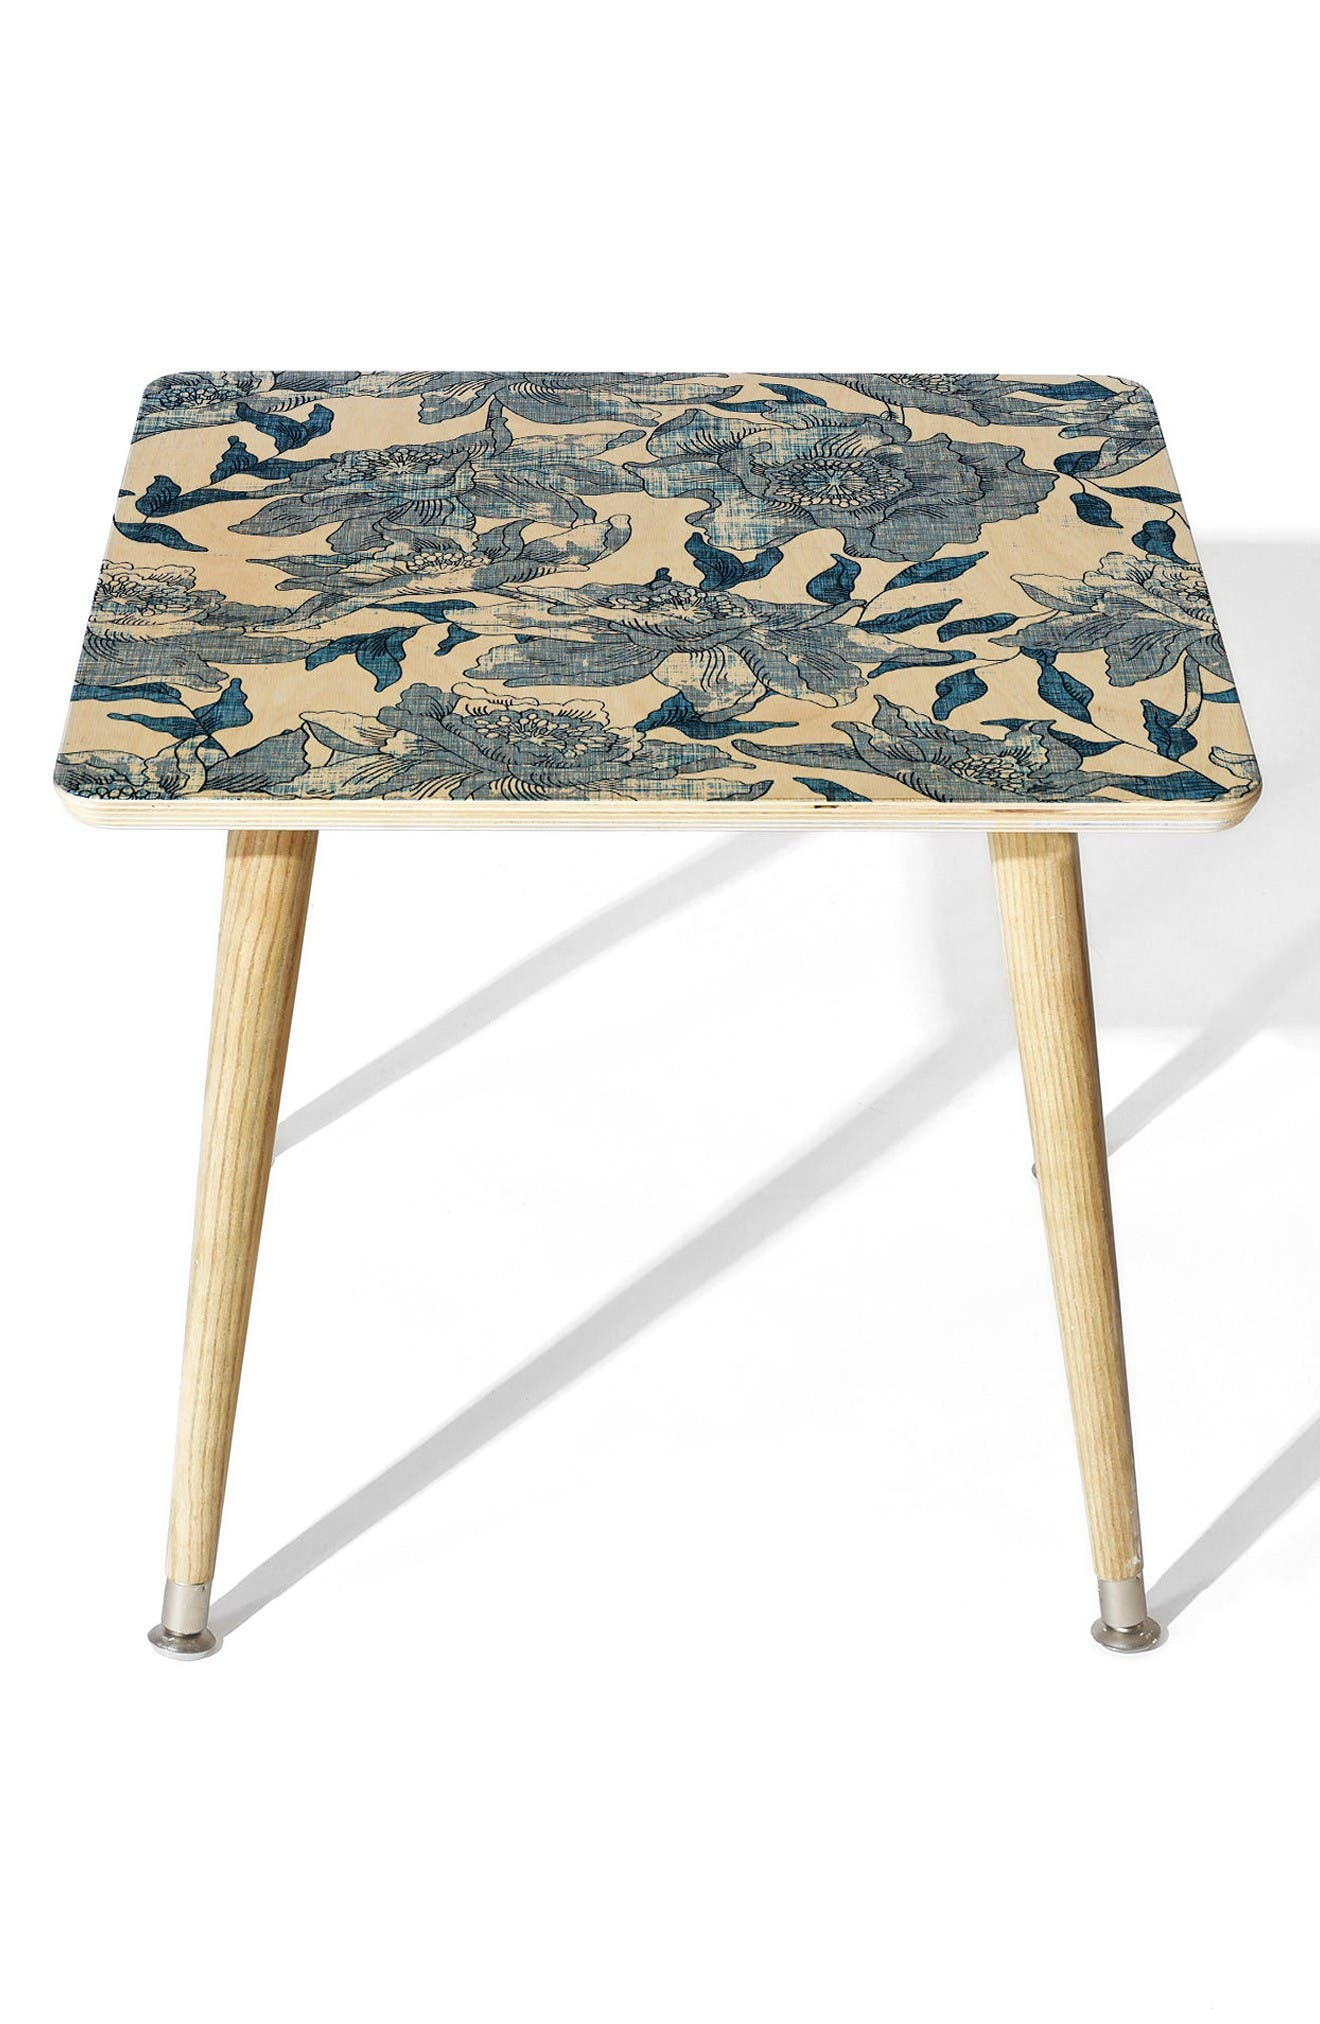 DENY Designs Summertime Indigo Side Table